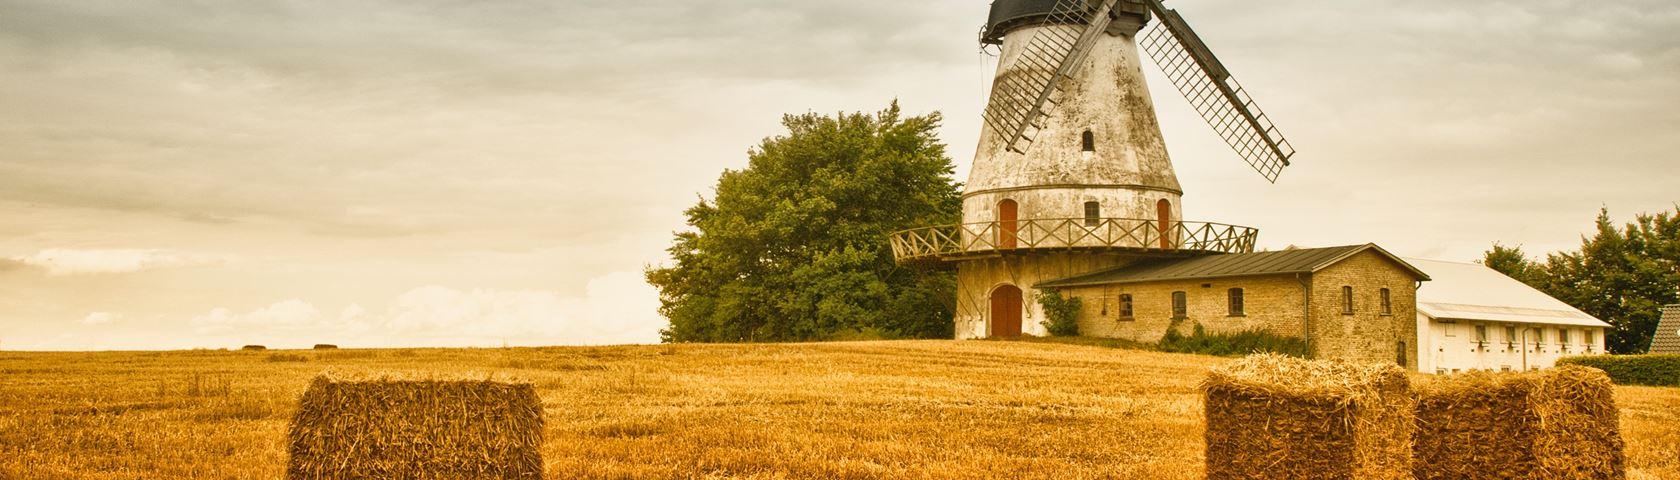 Farmland Windmill